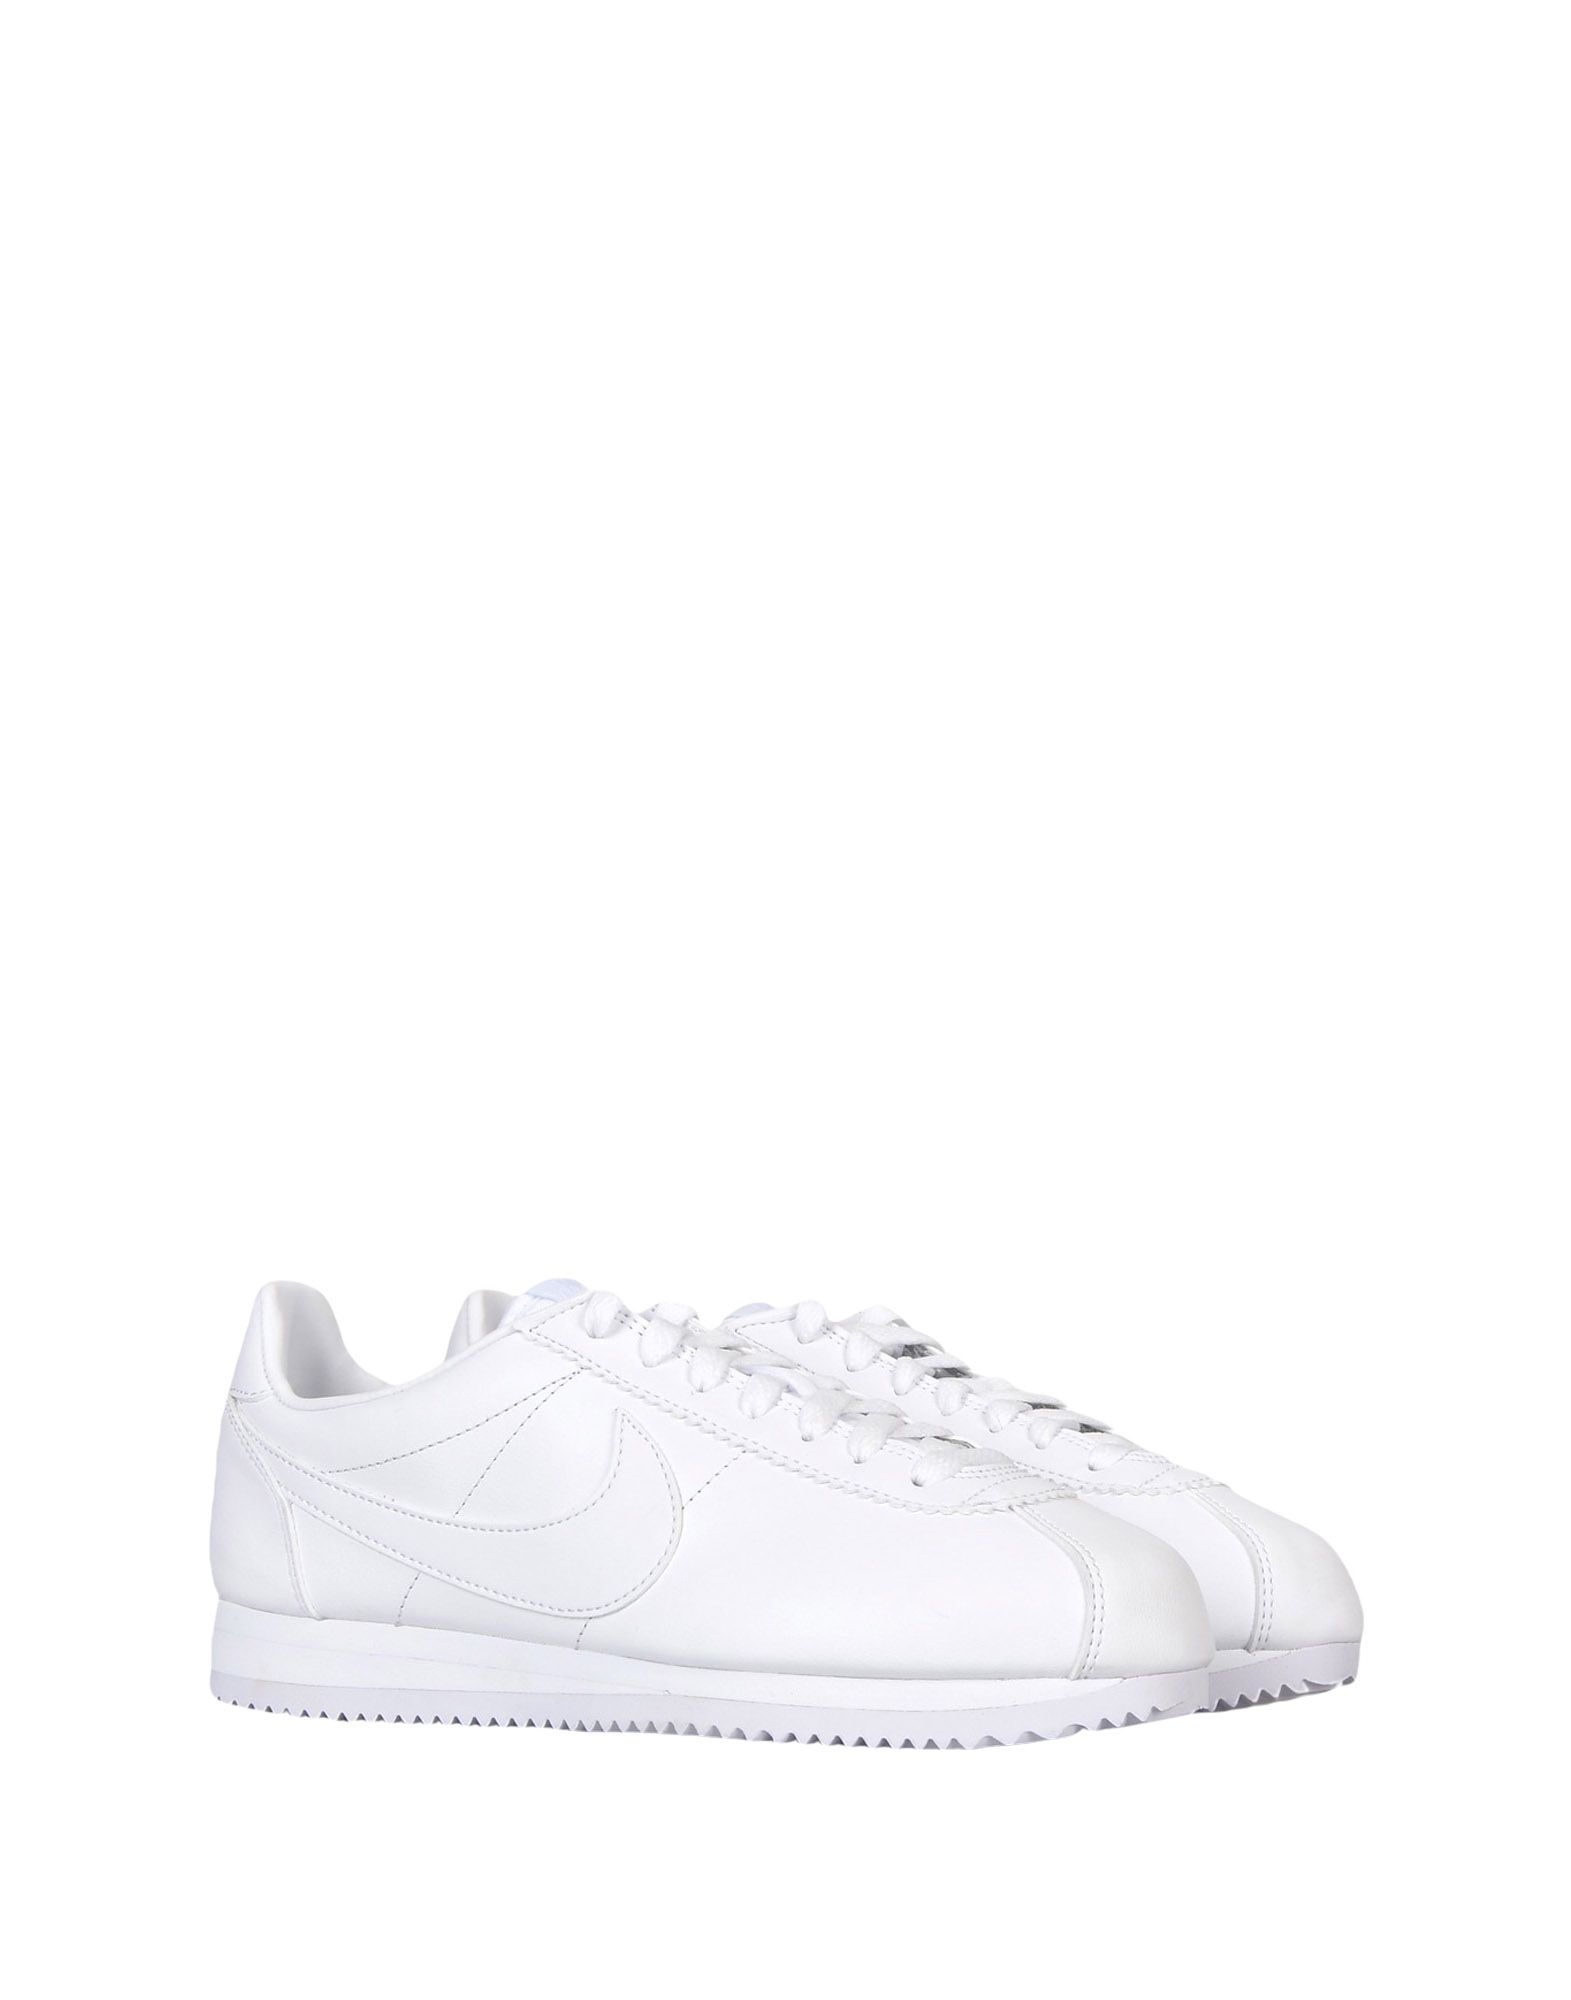 Nike   Classic Cortez Leather beliebte  11210283IK Gute Qualität beliebte Leather Schuhe 450624